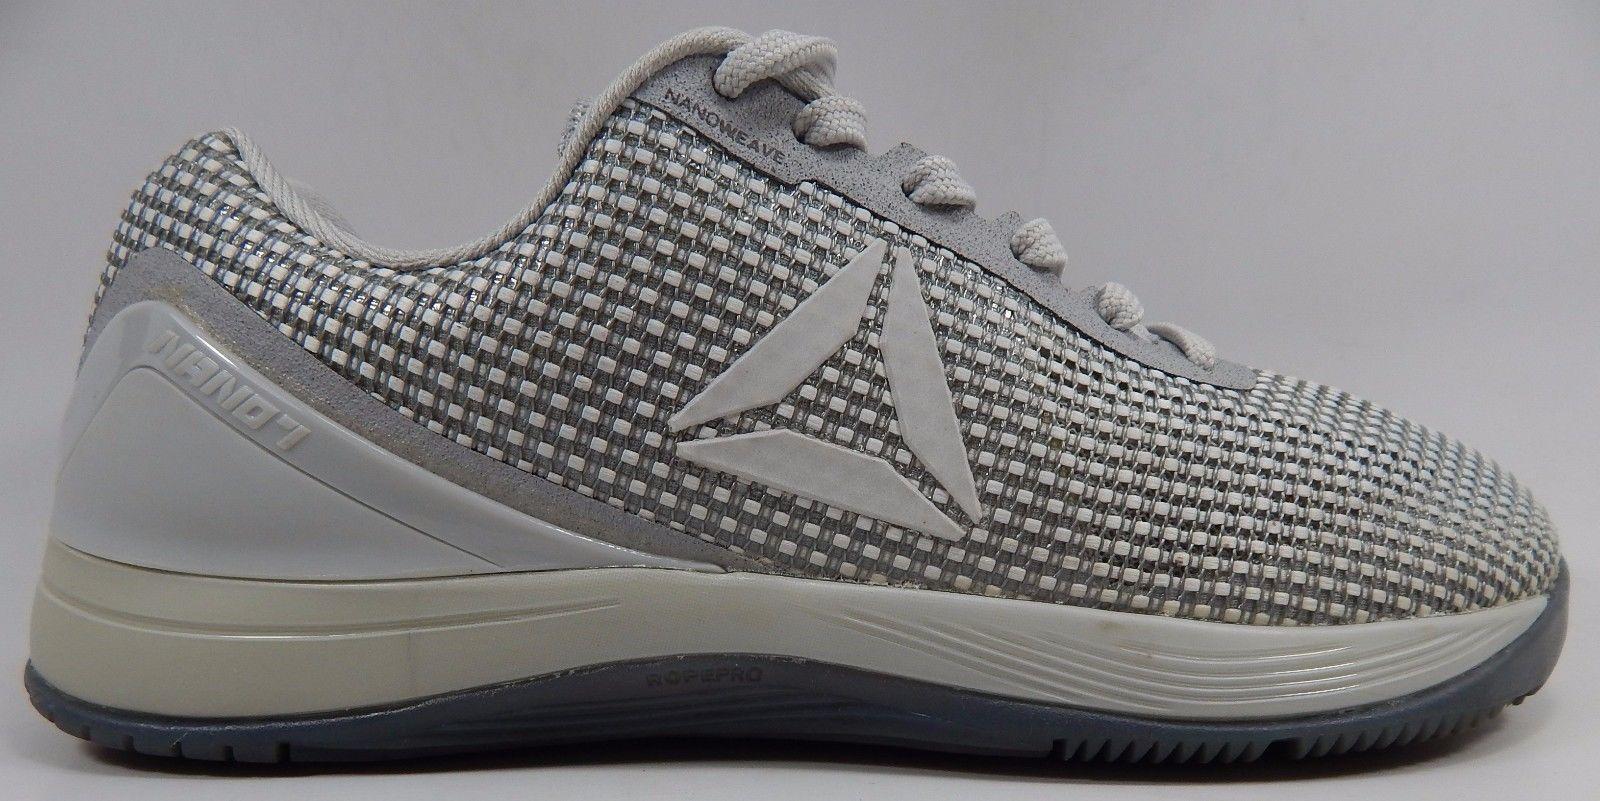 Reebok Crossfit Nano 7.0 Men's Training Shoe Size US 8 M (D) EU 40.5 Skull Grey